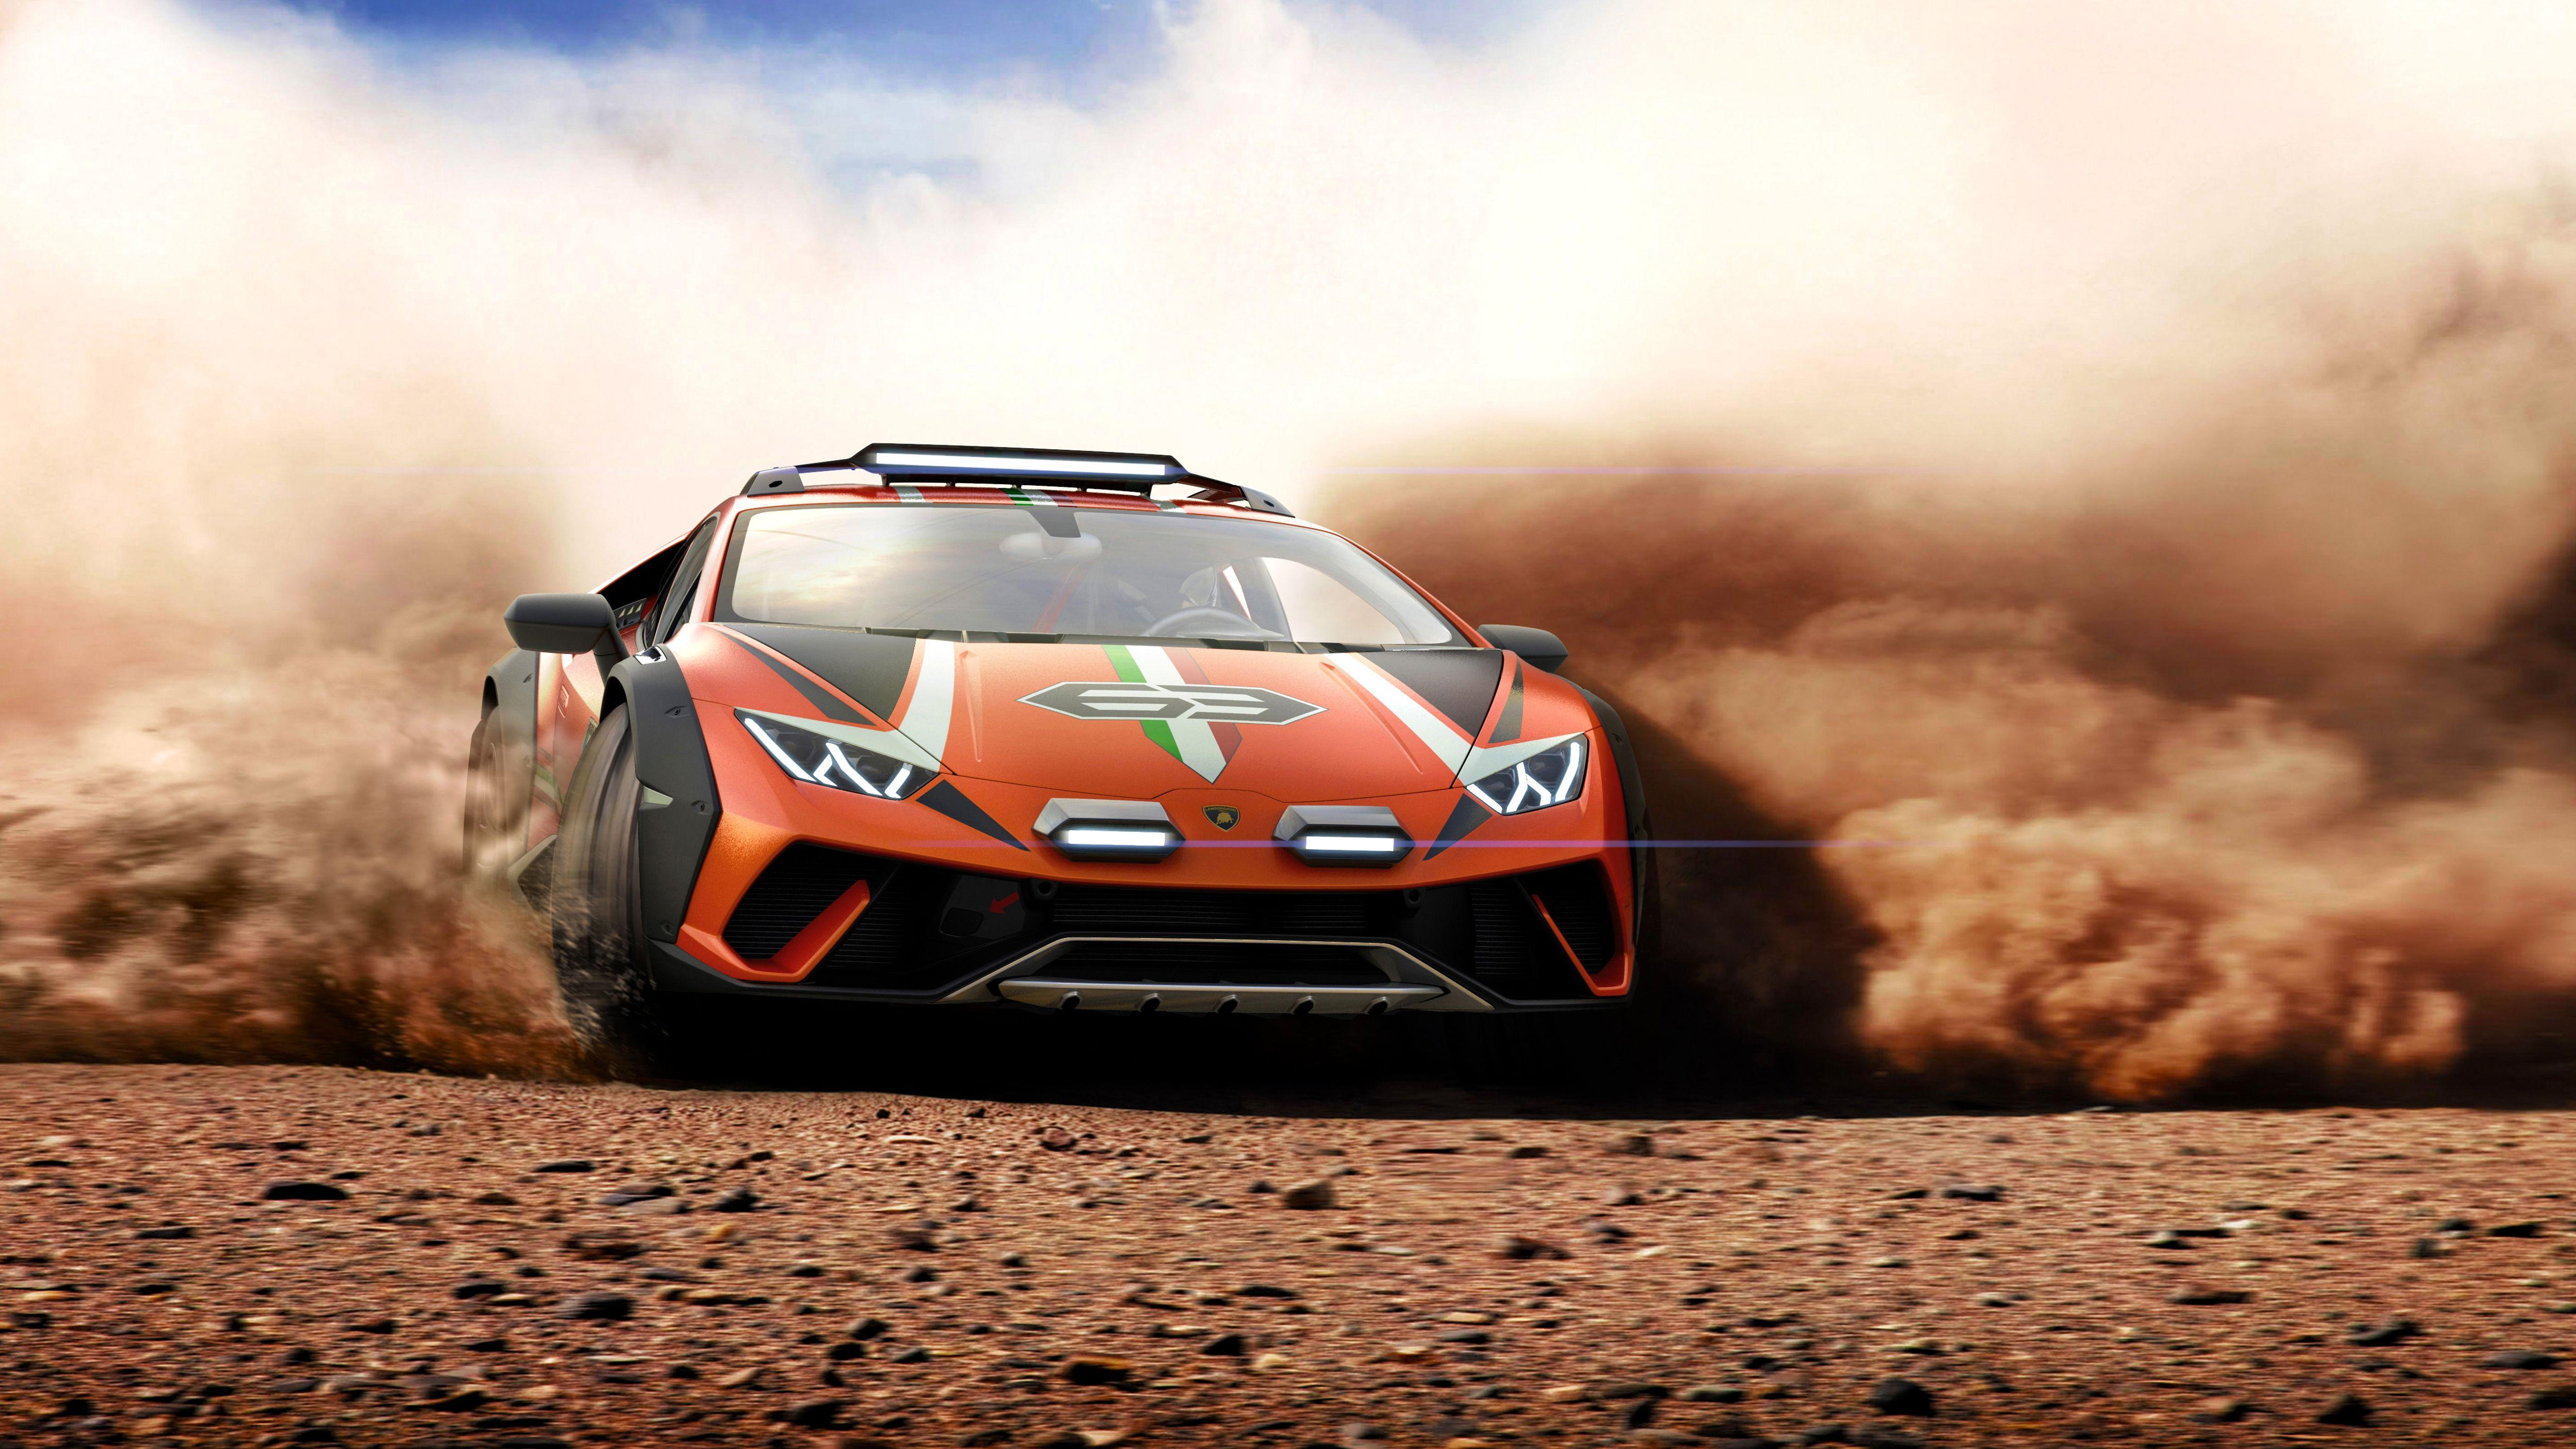 Lamborghini Huracán Sterrato \u2013 Crazy Off,Road Supercar Concept